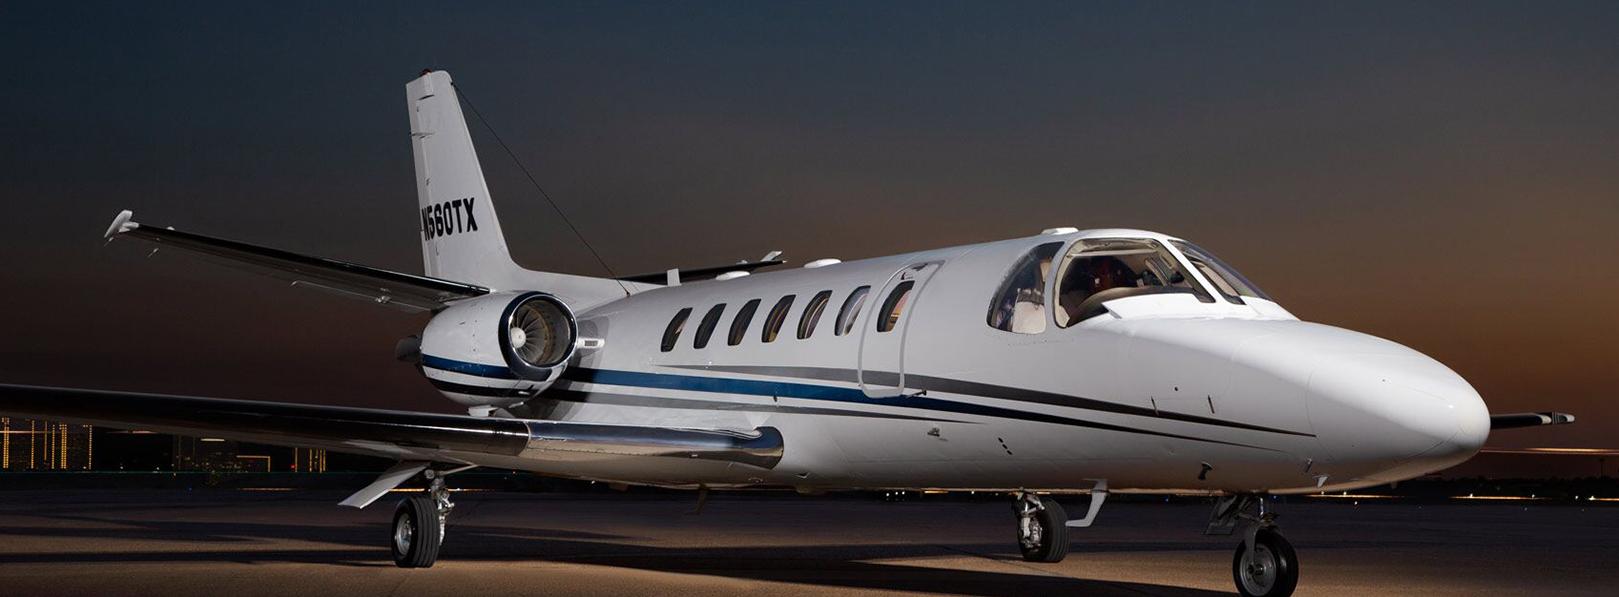 Pollard Aircraft | Fort Worth, TX